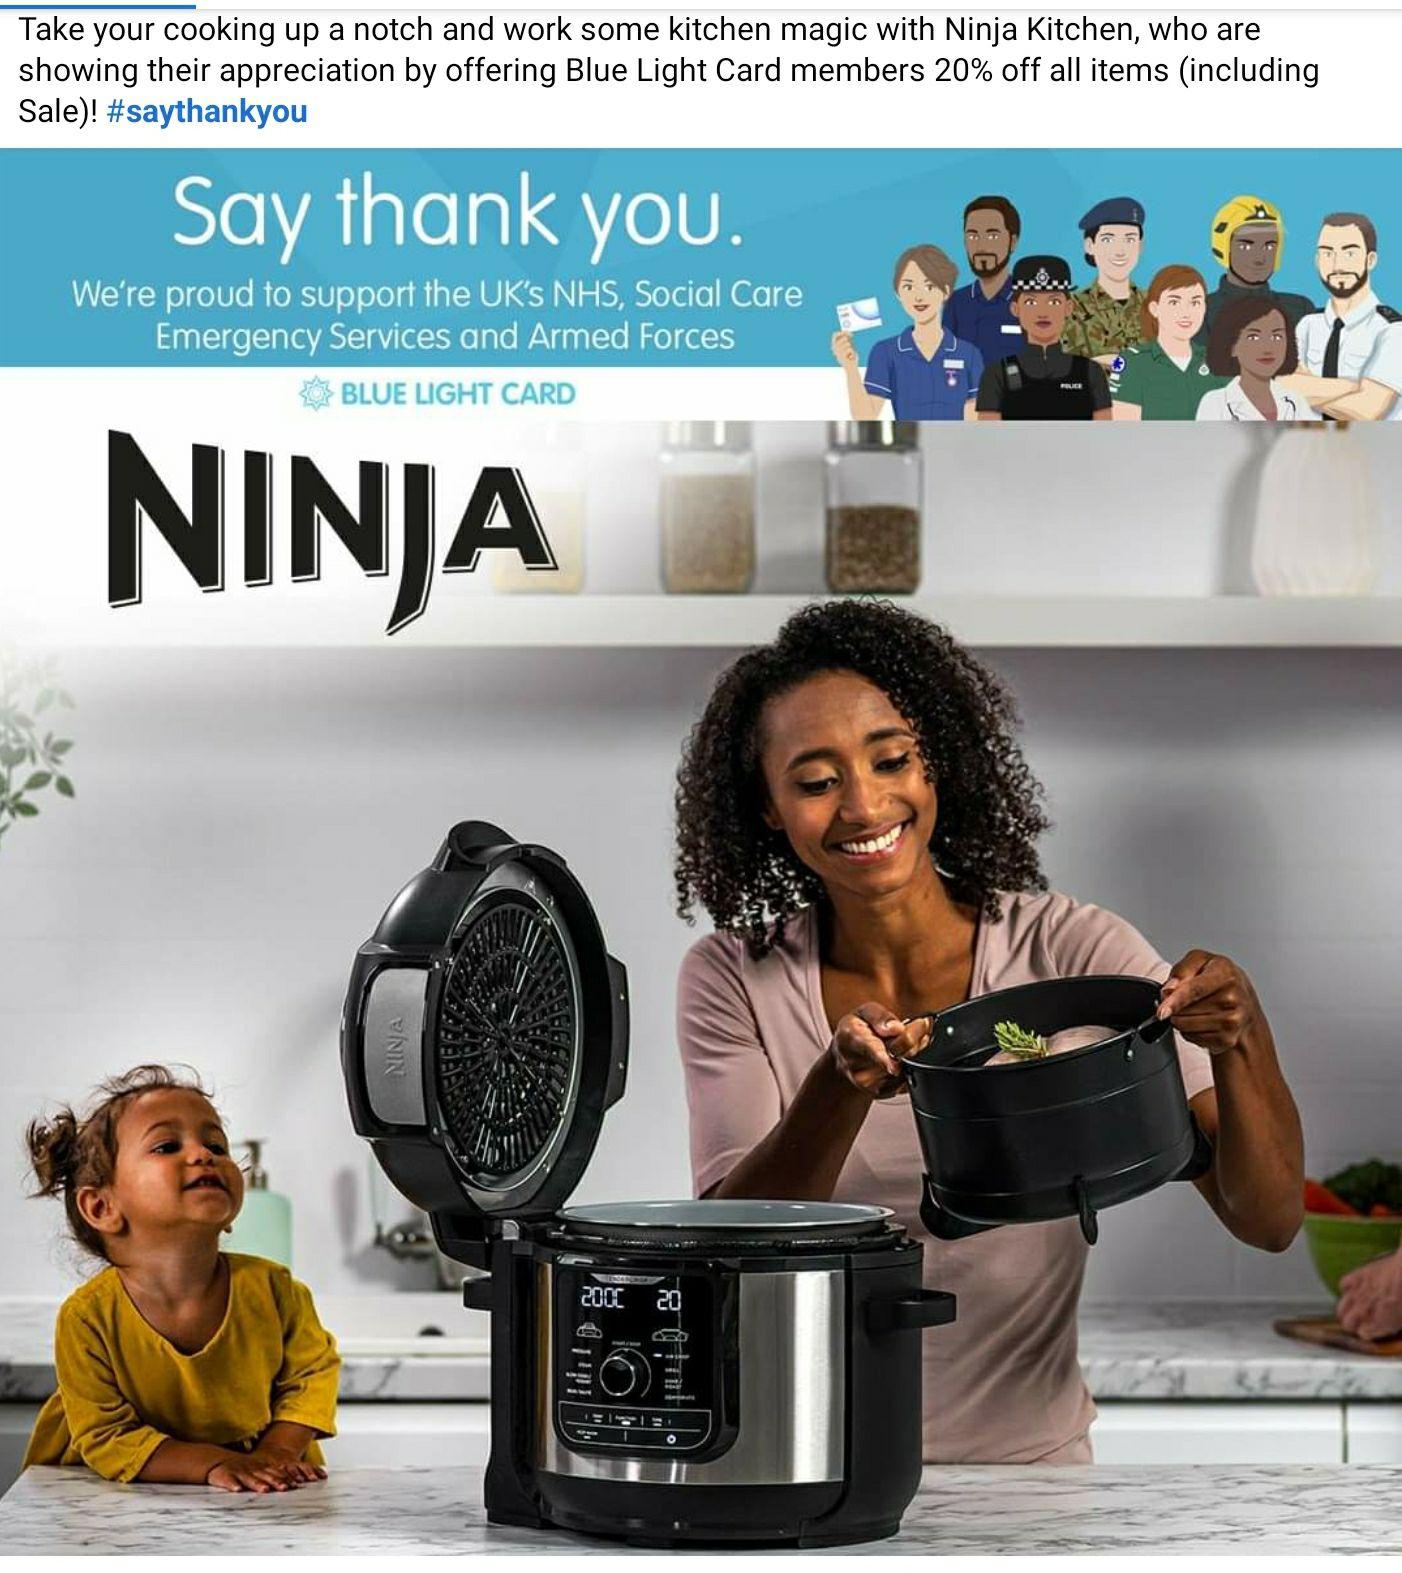 20% of Ninja Kitchen with Blue Light Card